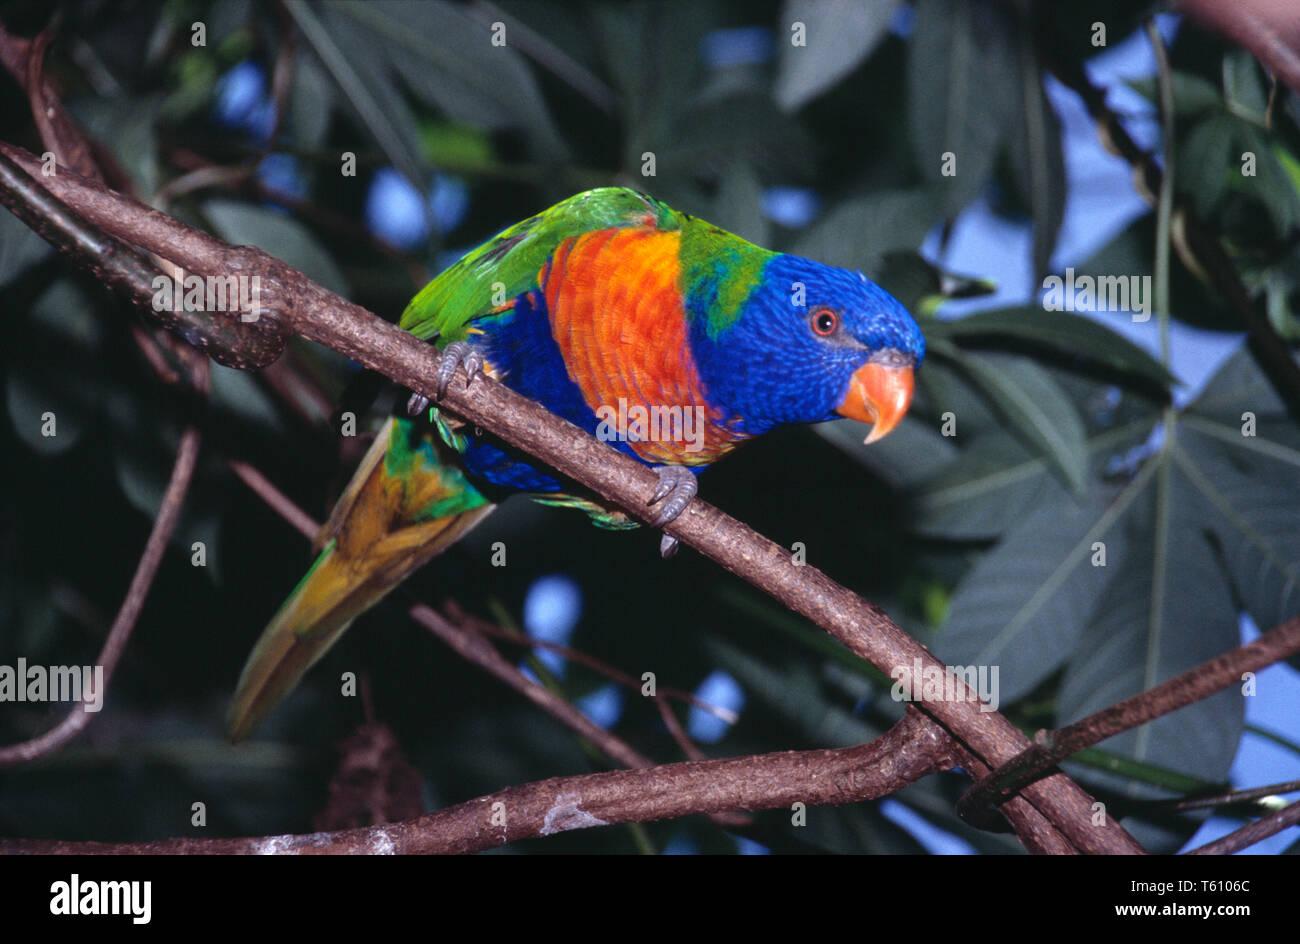 Australia. Queensland. Wildlife. Bird. Rainbow Lorikeet. Trichoglossus moluccanus. - Stock Image